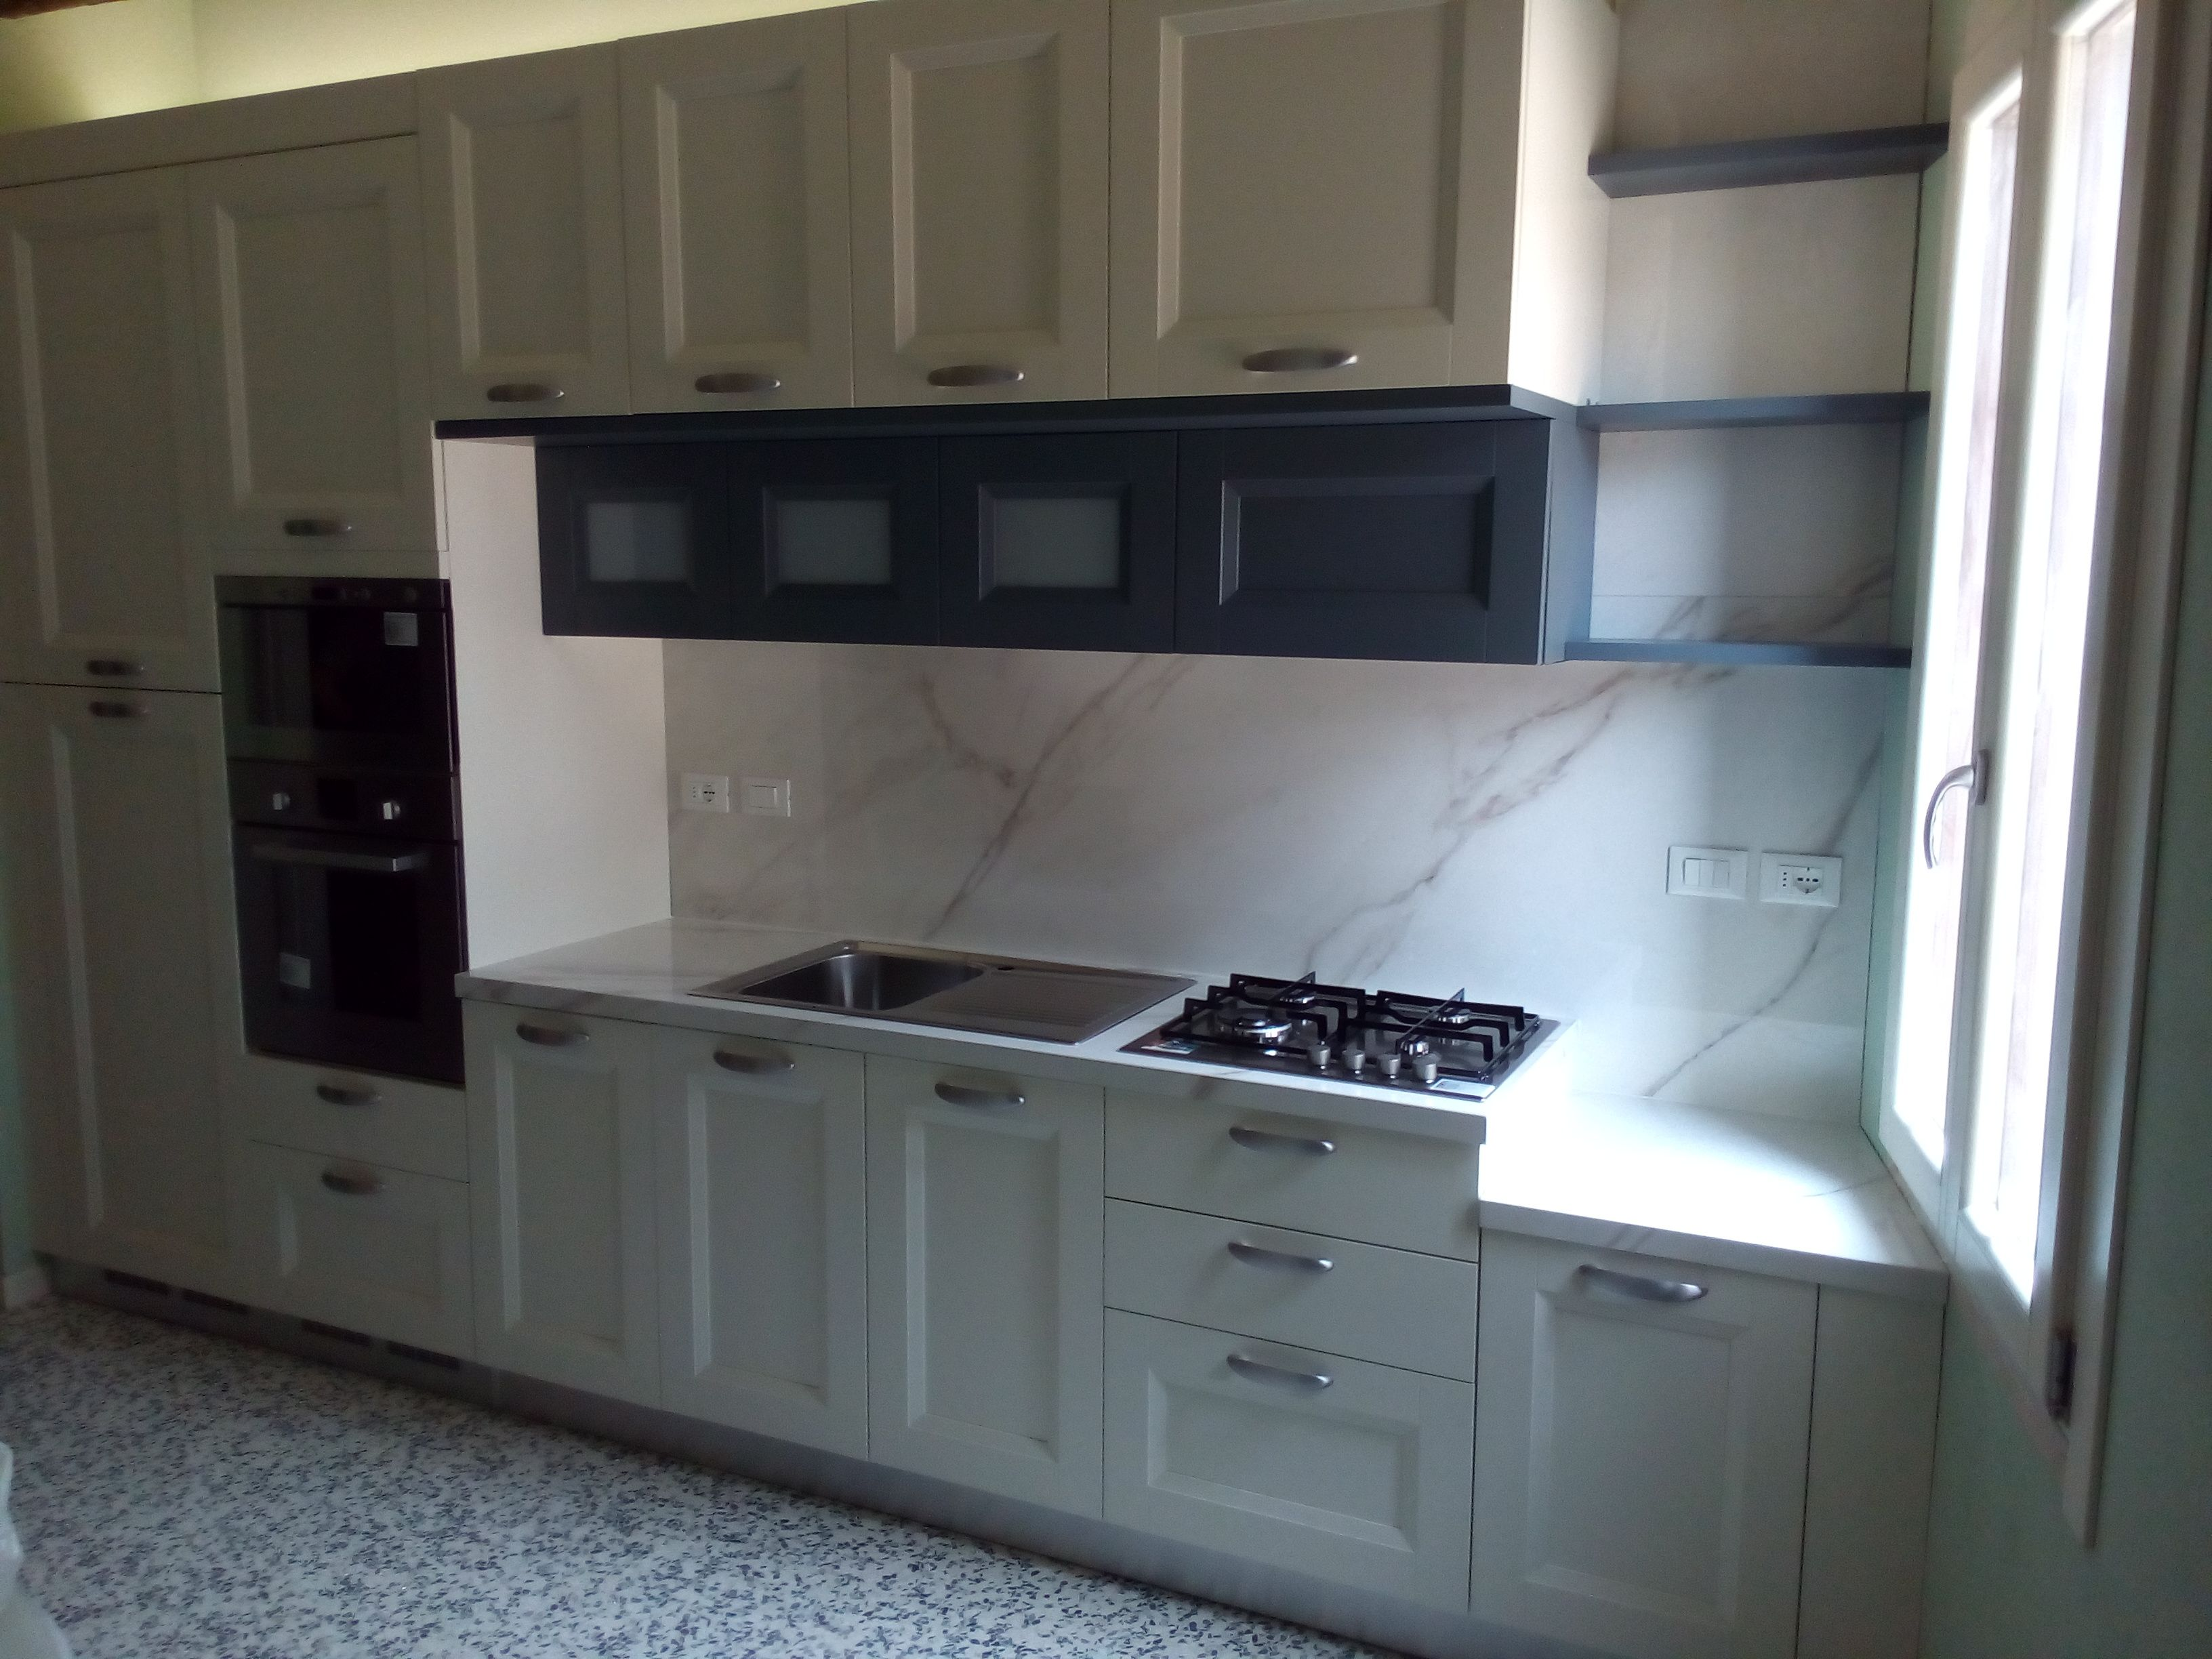 Top cucina kerlite - Kerlite rivestimento cucina ...